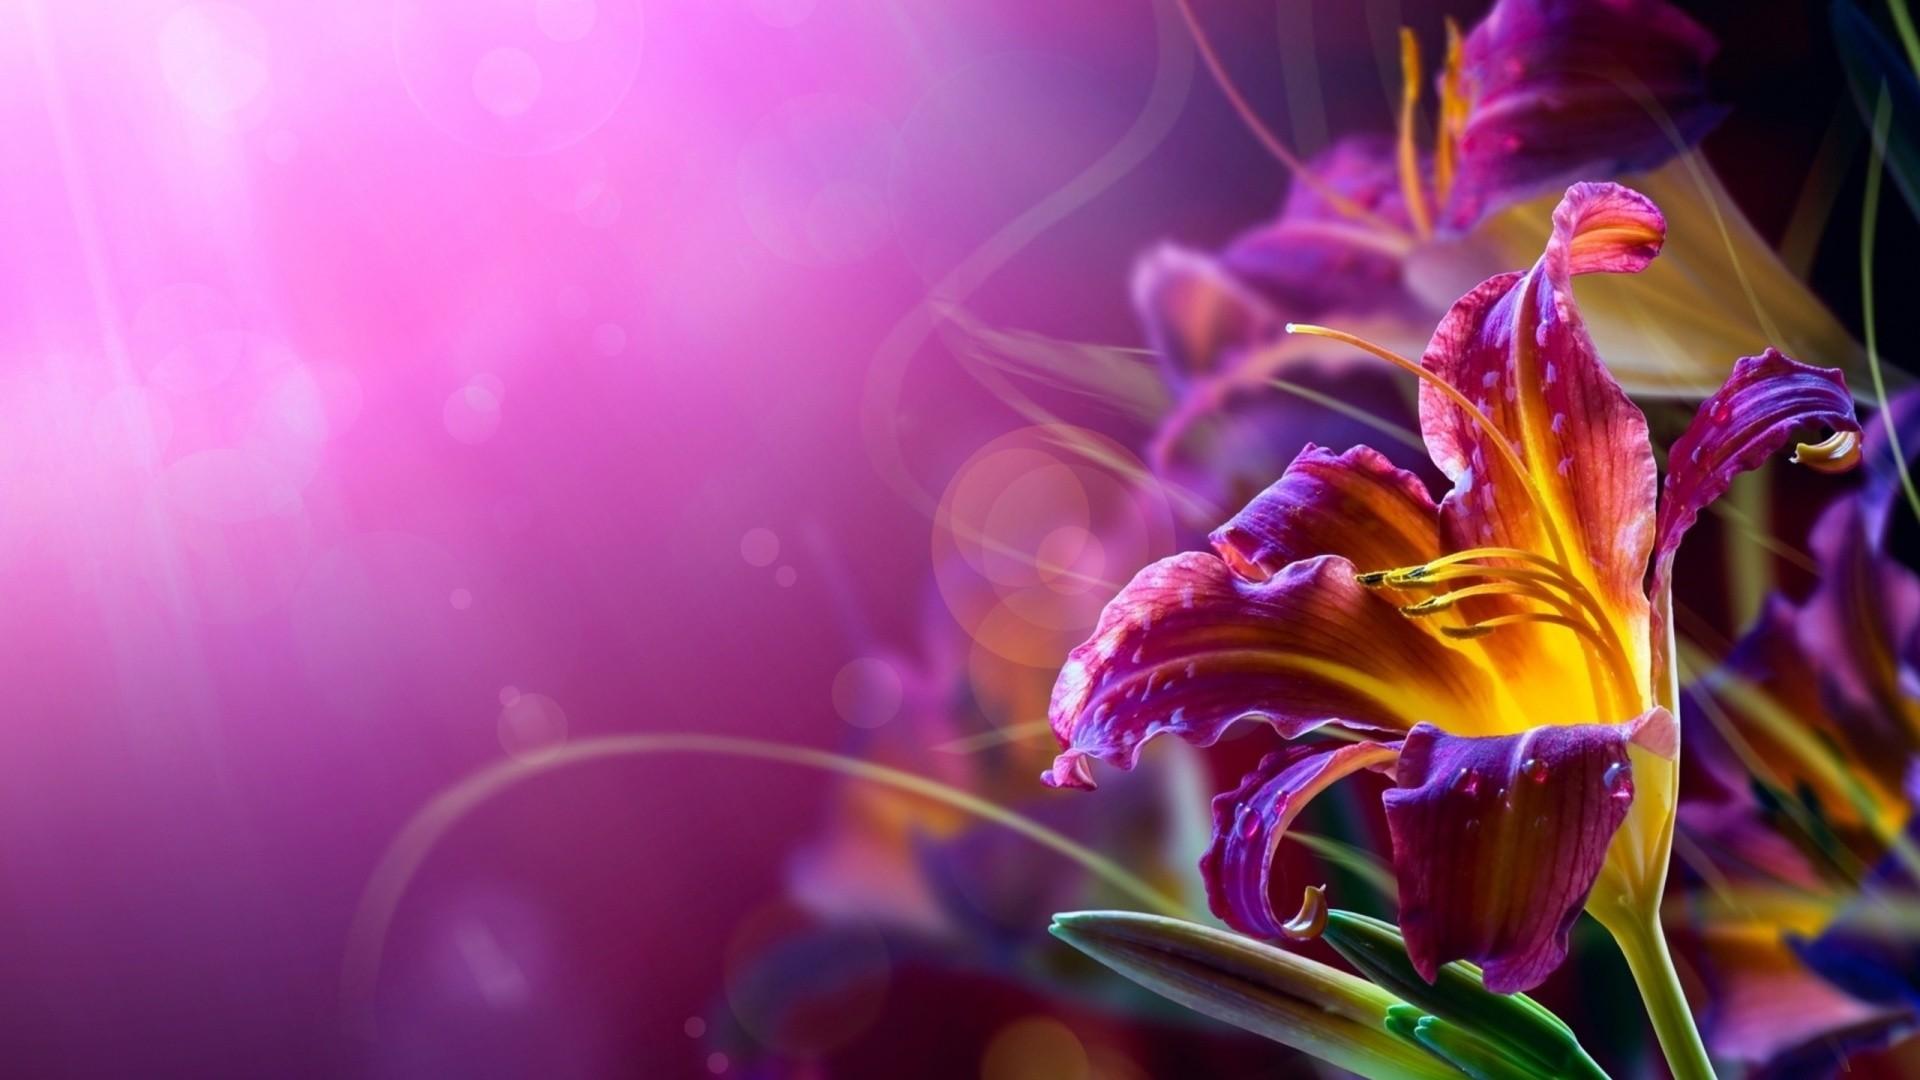 hd wallpapers flowers1